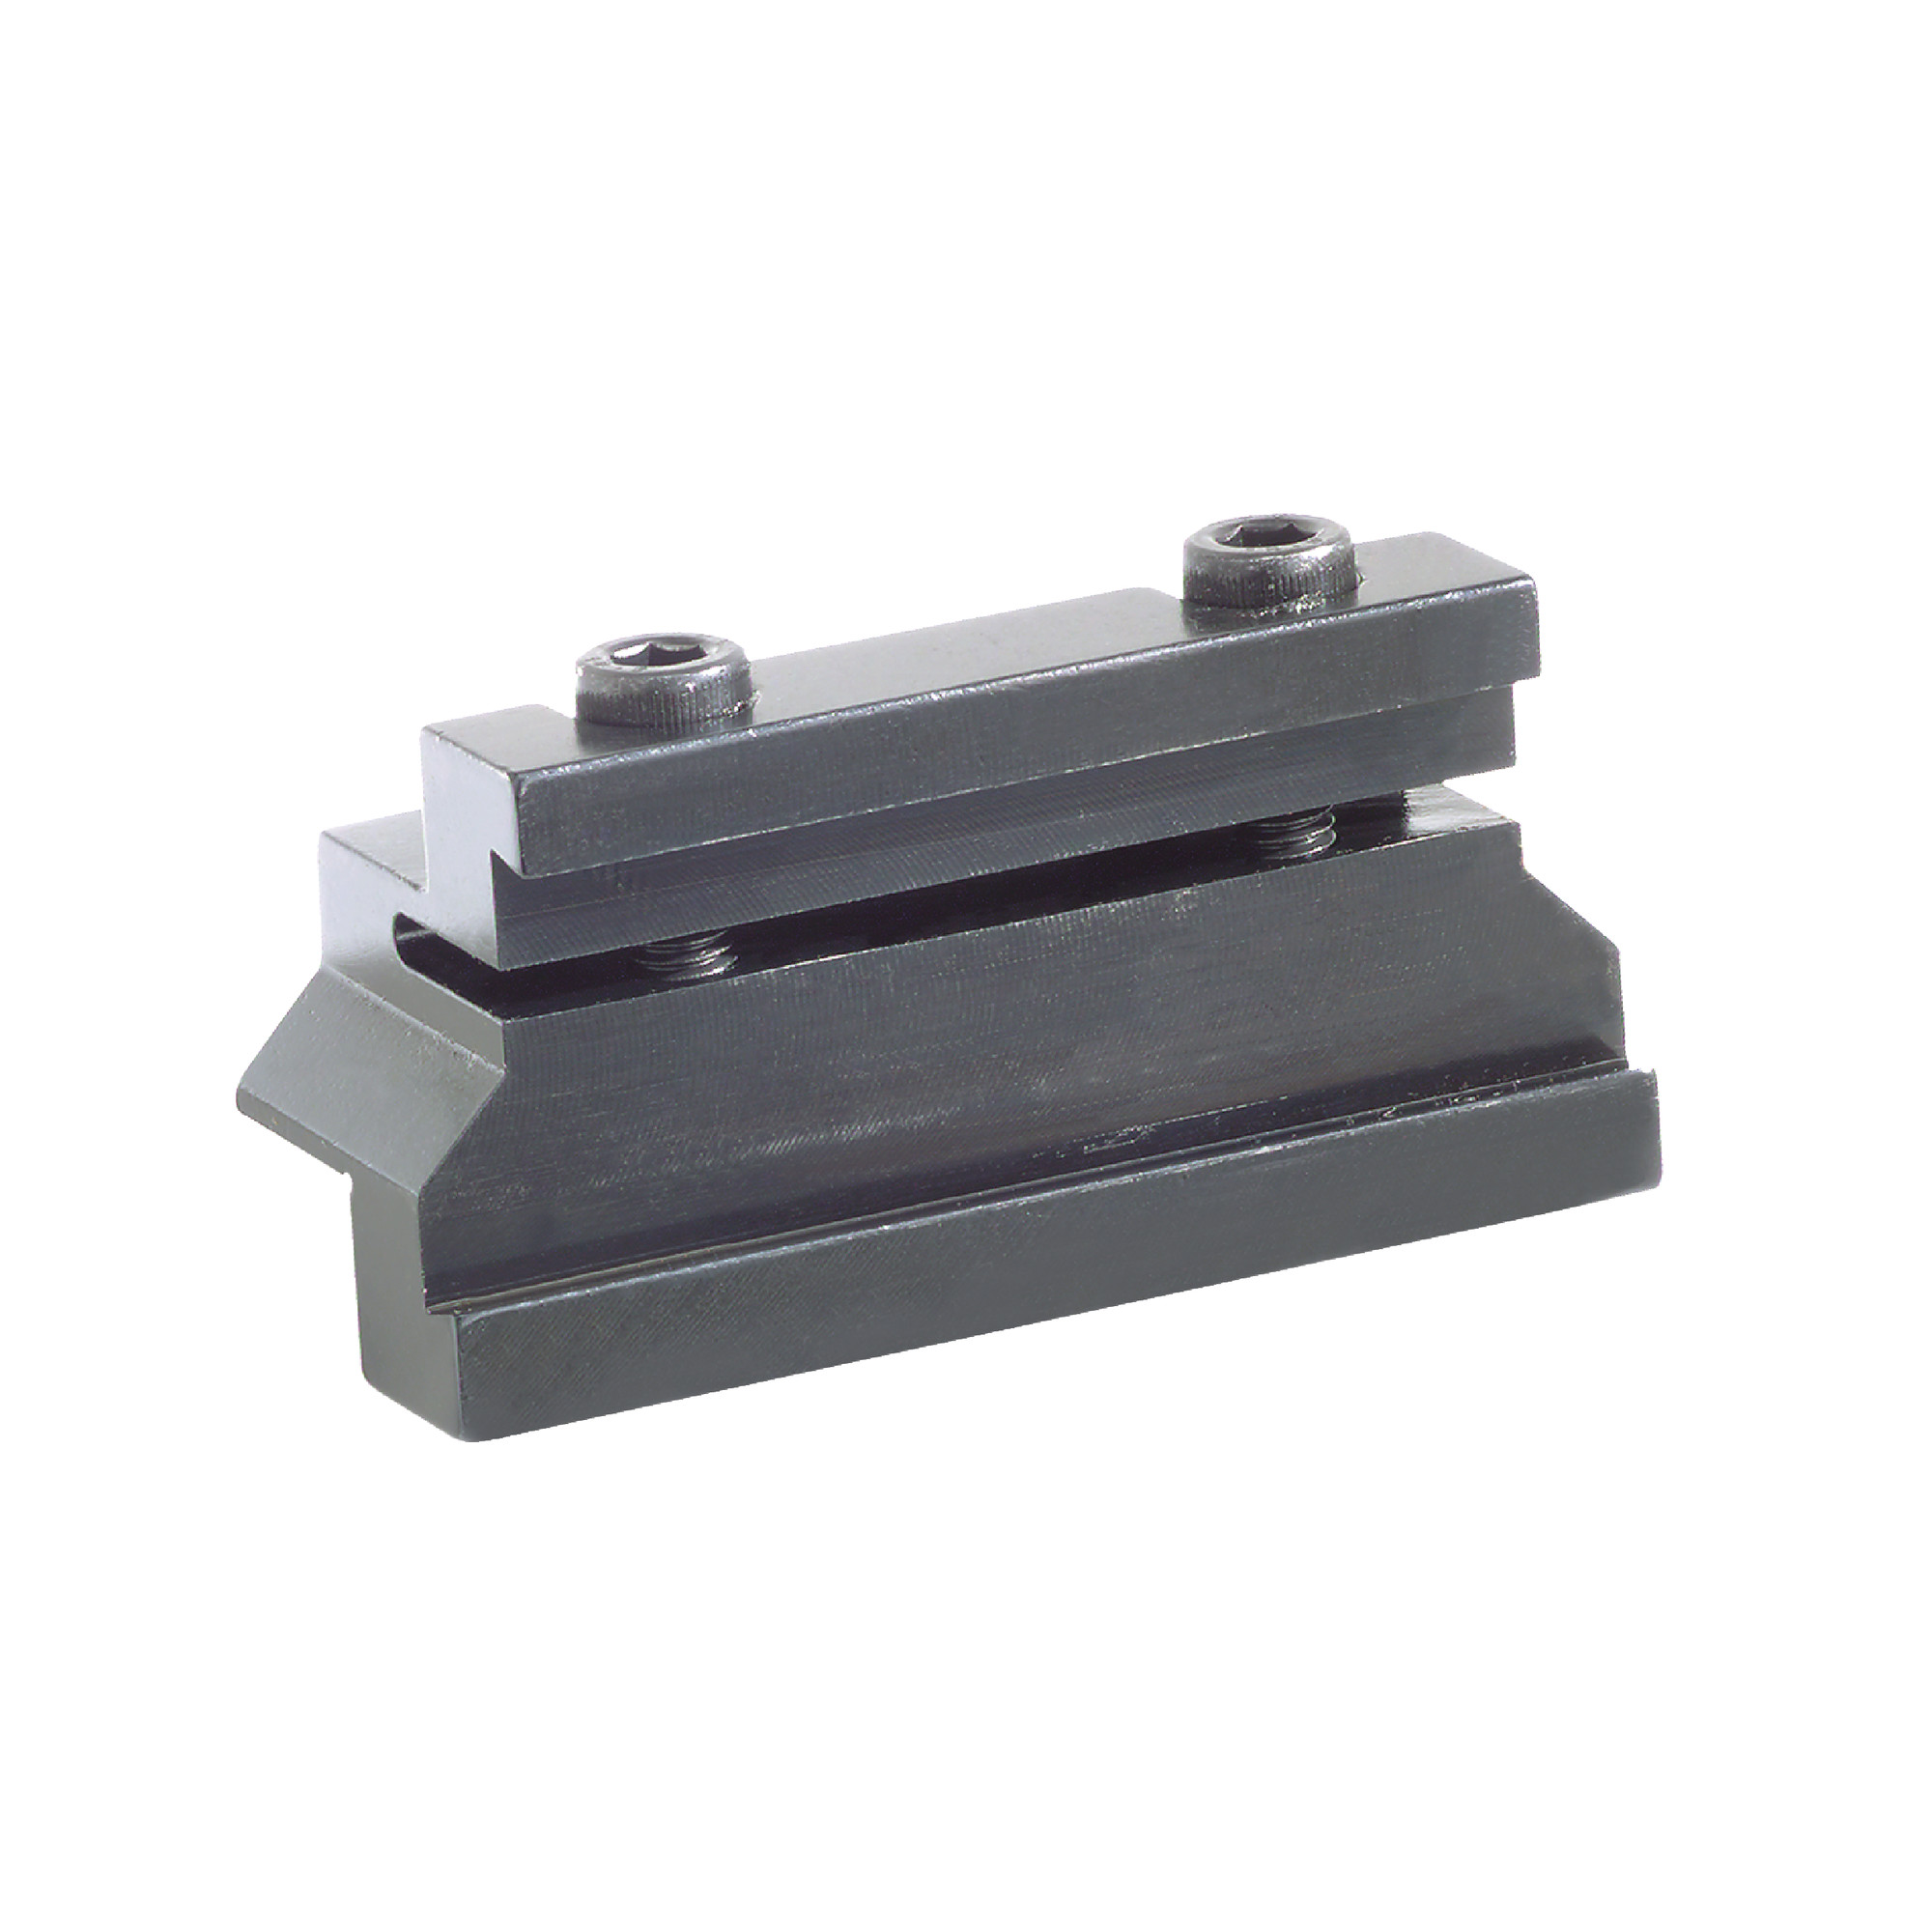 "ISCAR - SGTBN 16-2 Blade Block / .63"" X 0.63"" Shank / For 0.748"" (19mm) Height Blades"